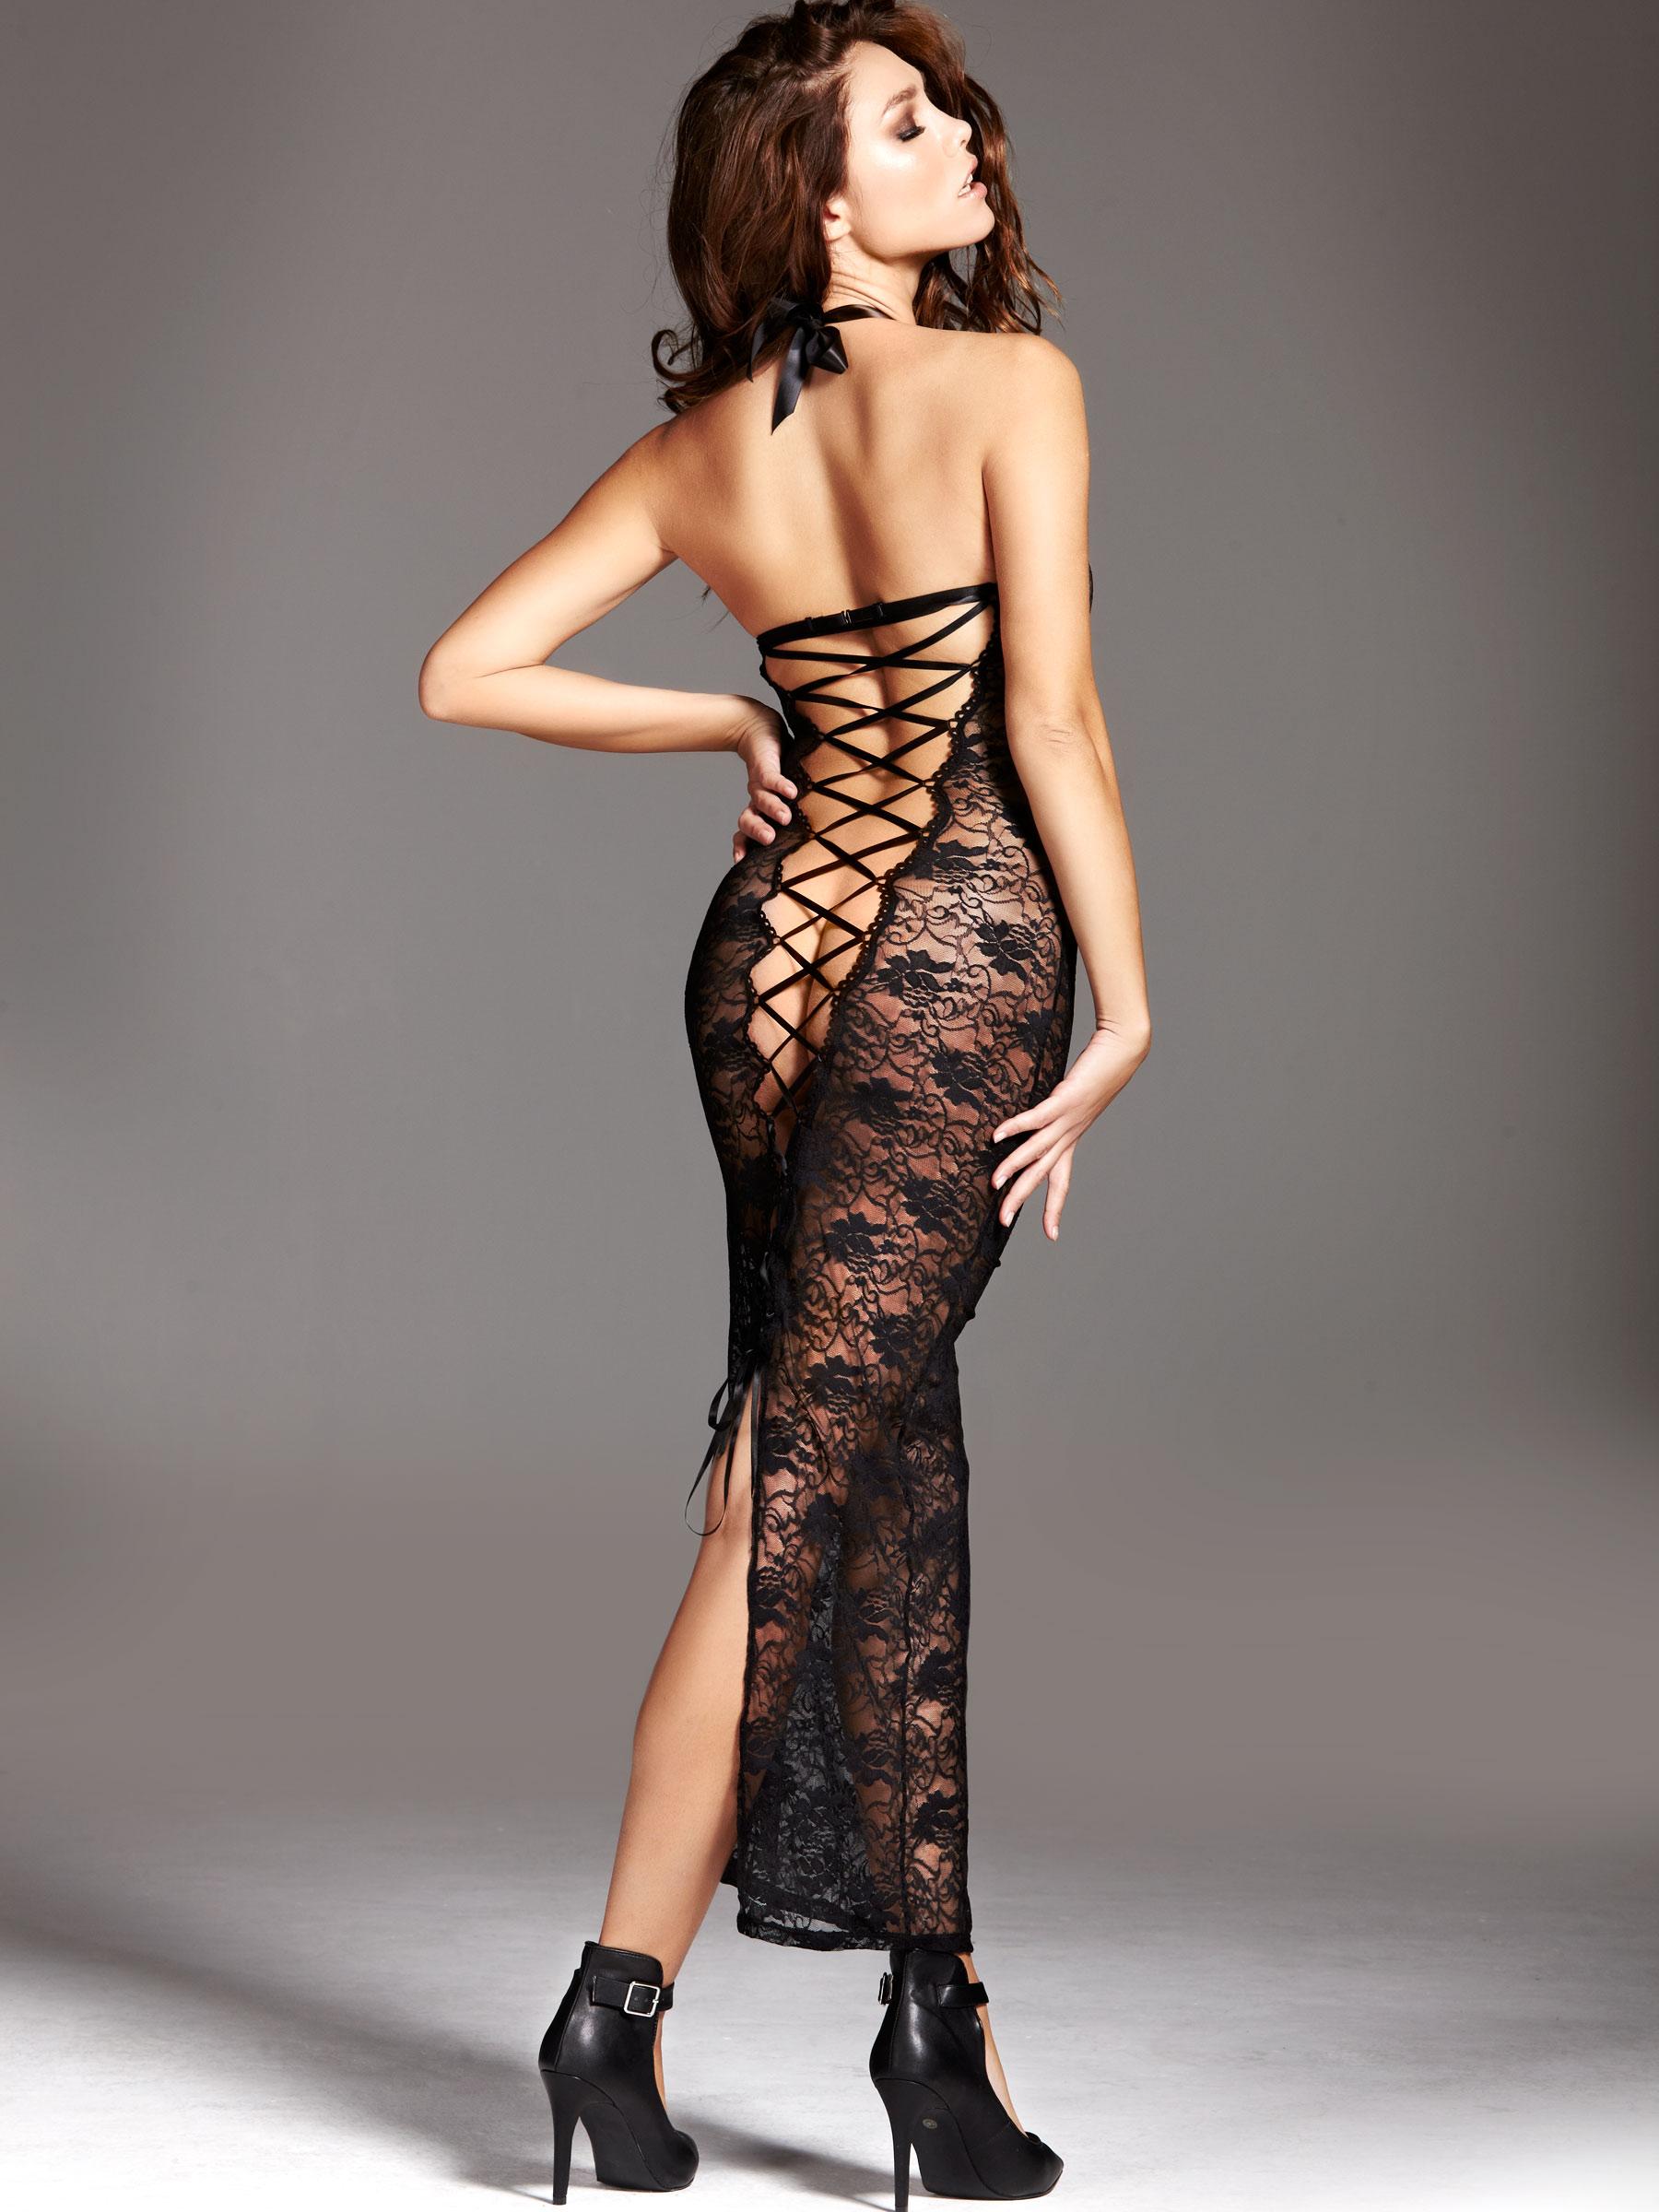 Details about Ann Summers Womens Amira Long Lace Dress Black Ladies ...